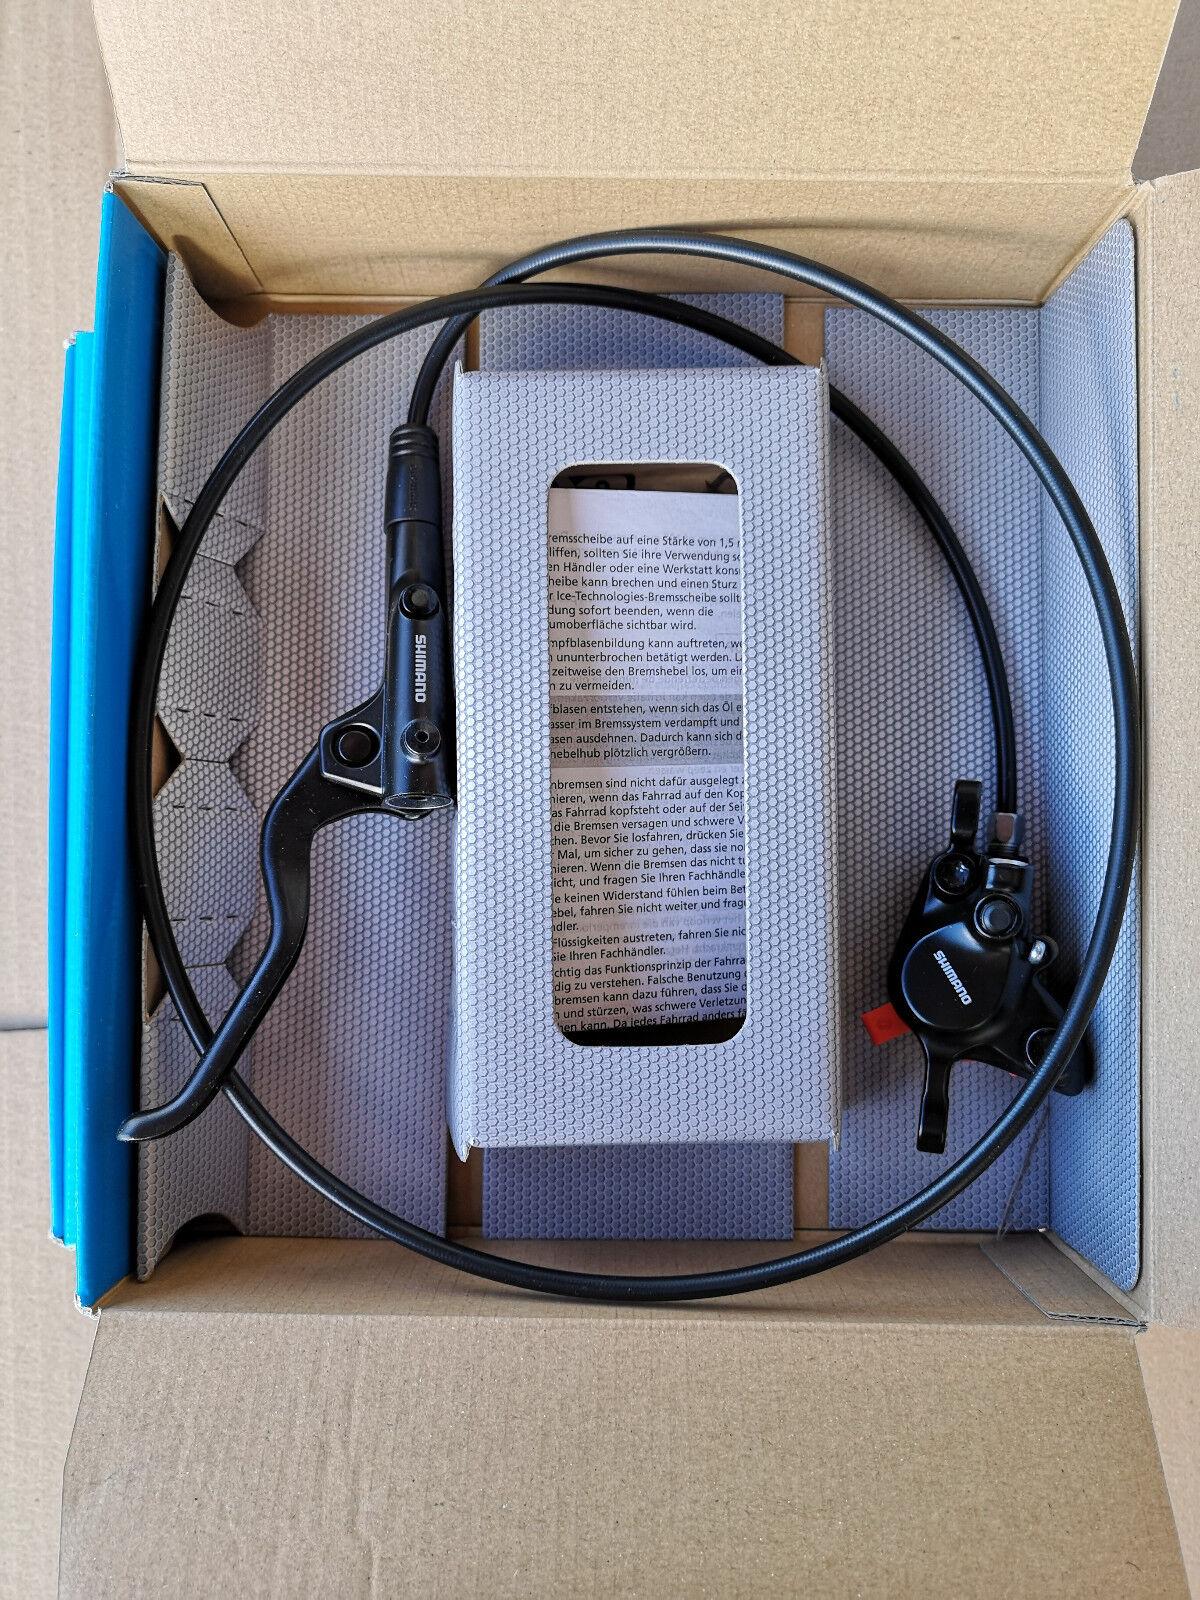 Shimano Shimano Shimano BR-MT200/BL-MT201 Scheibenbremsen, Set vorn & hinten, schwarz, NEU 325374